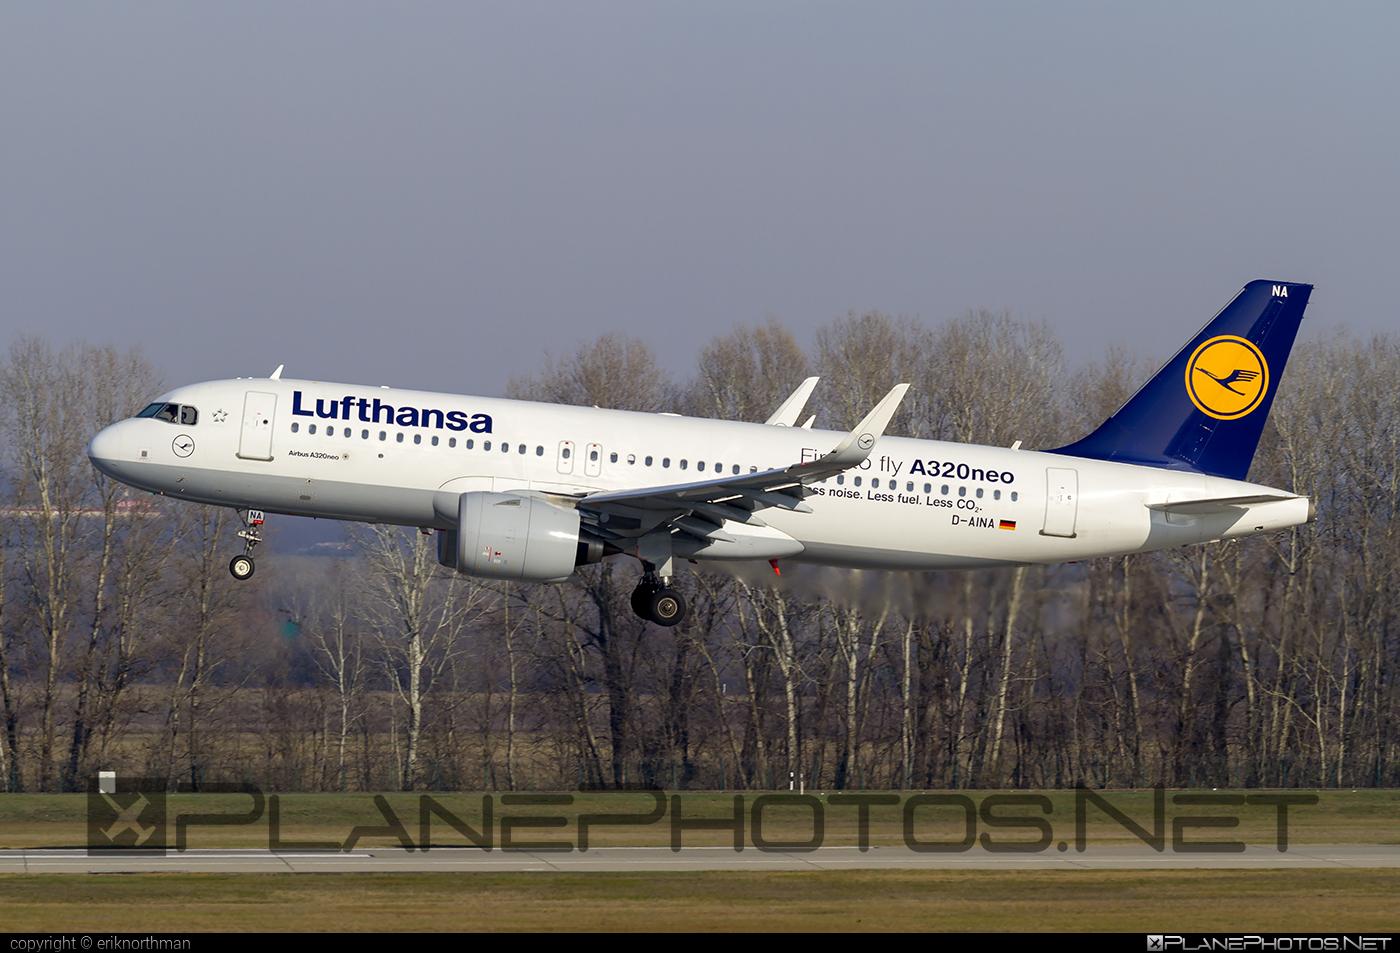 Airbus A320-271N - D-AINA operated by Lufthansa #a320 #a320family #a320neo #airbus #airbus320 #lufthansa